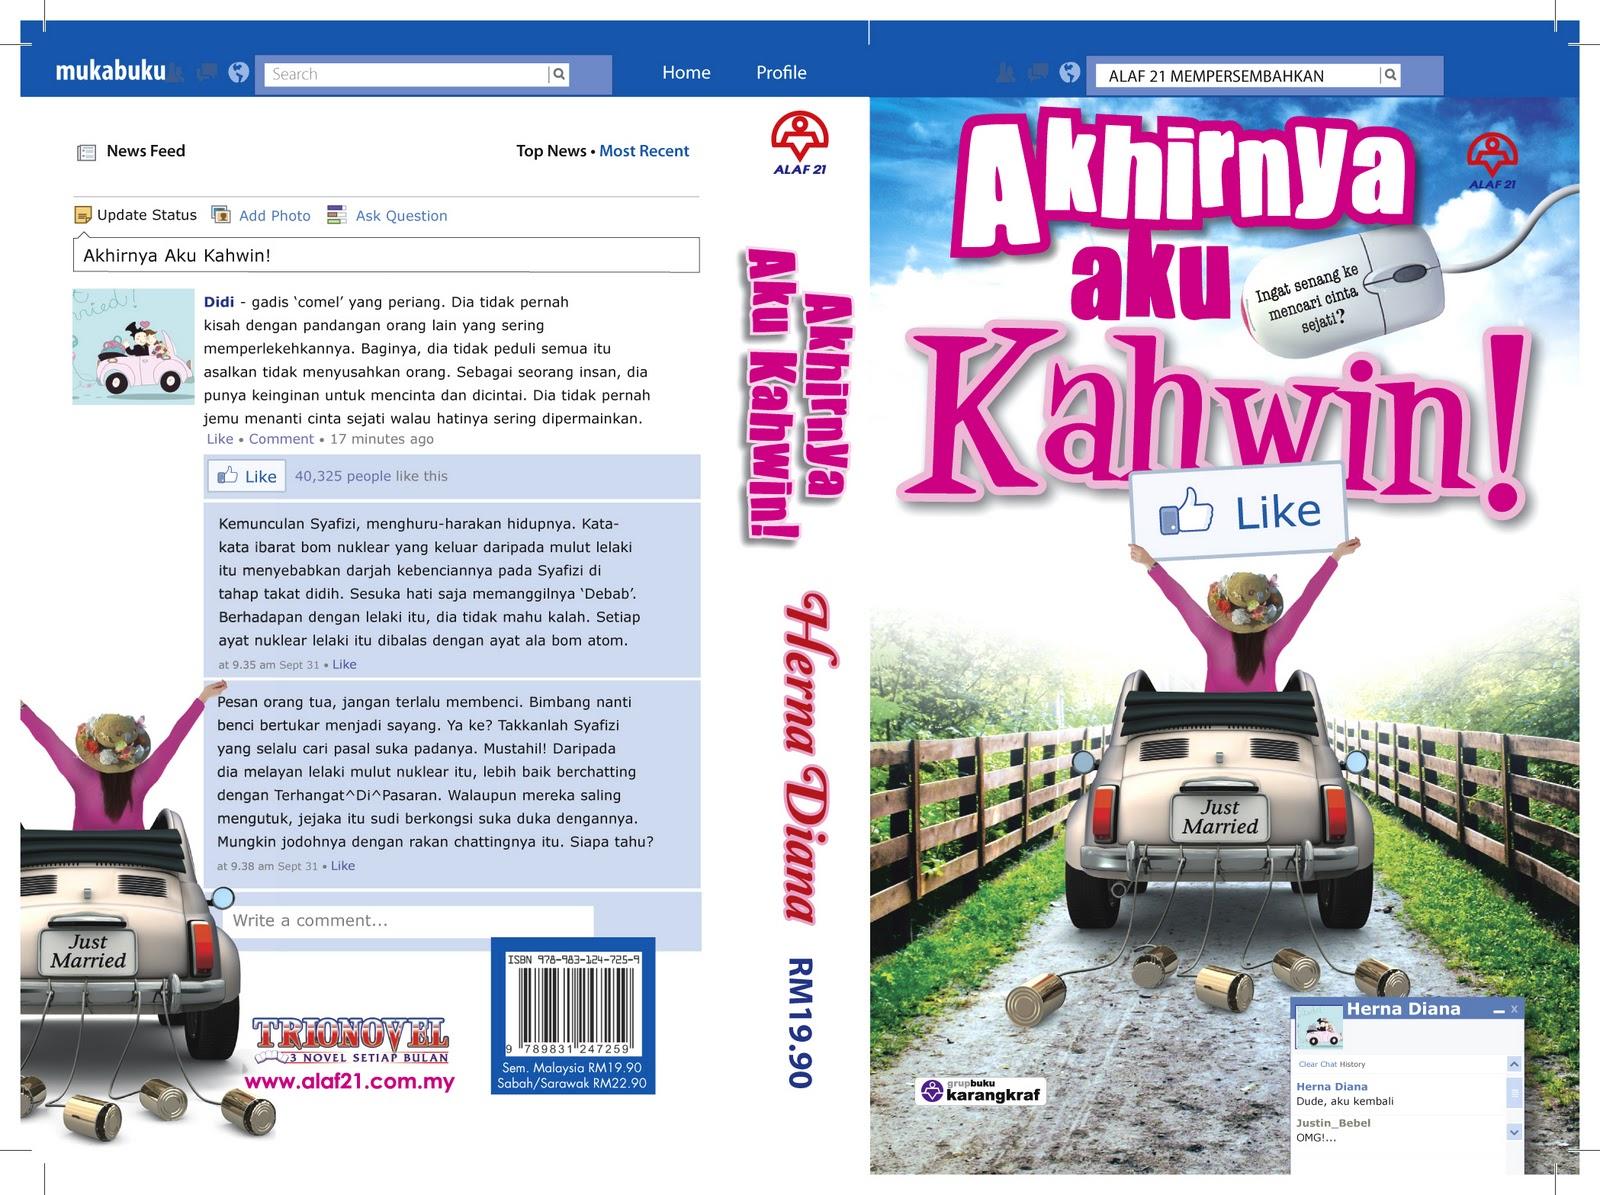 inilah cover novel terbaru HD (^_^)